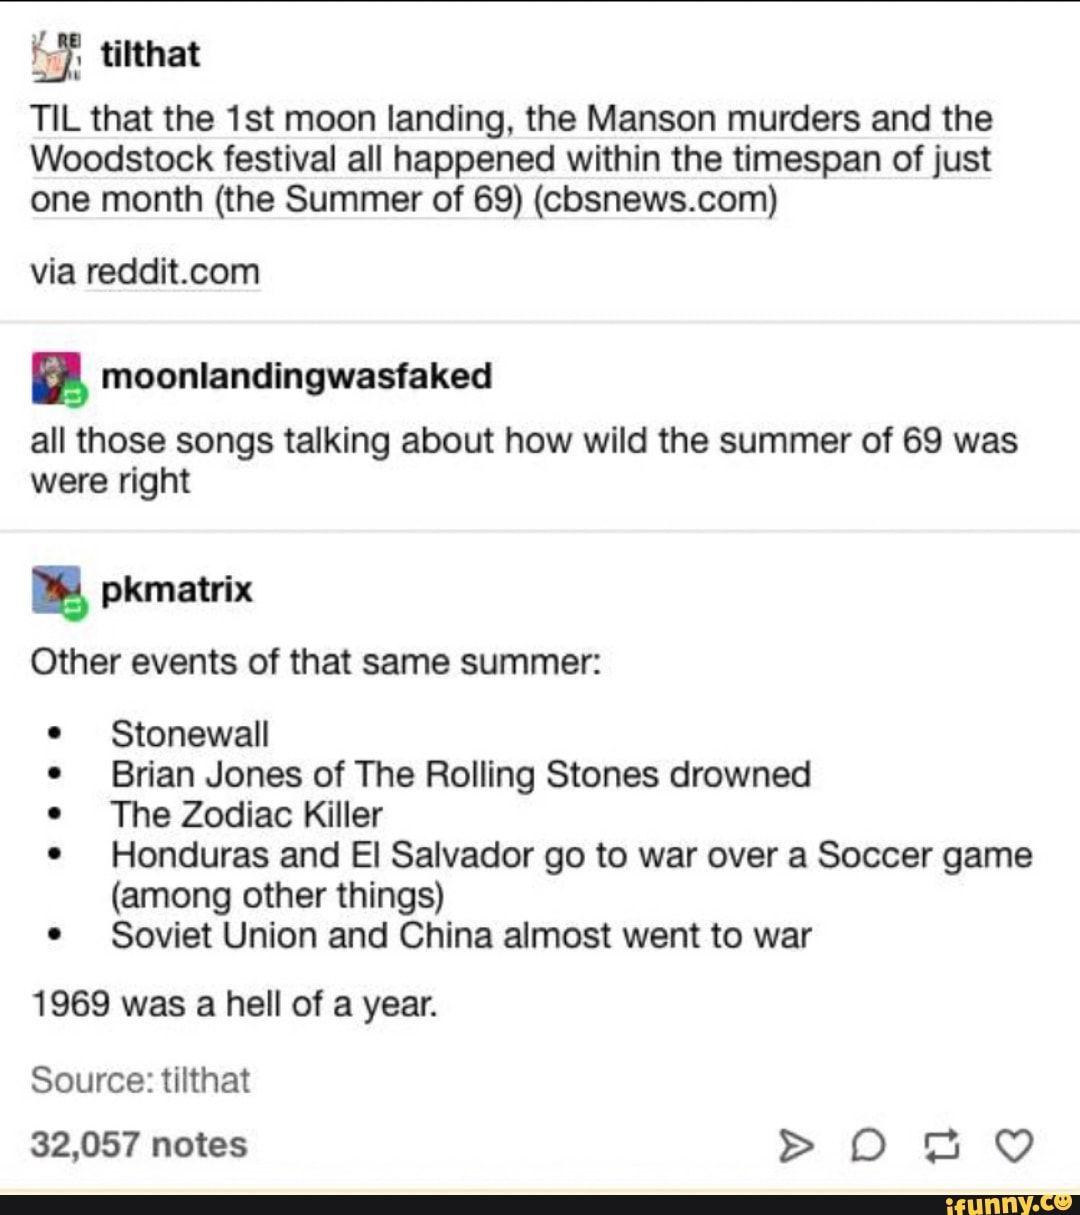 LT tilthat TIL that the 1st moon landing, the Manson murders and the